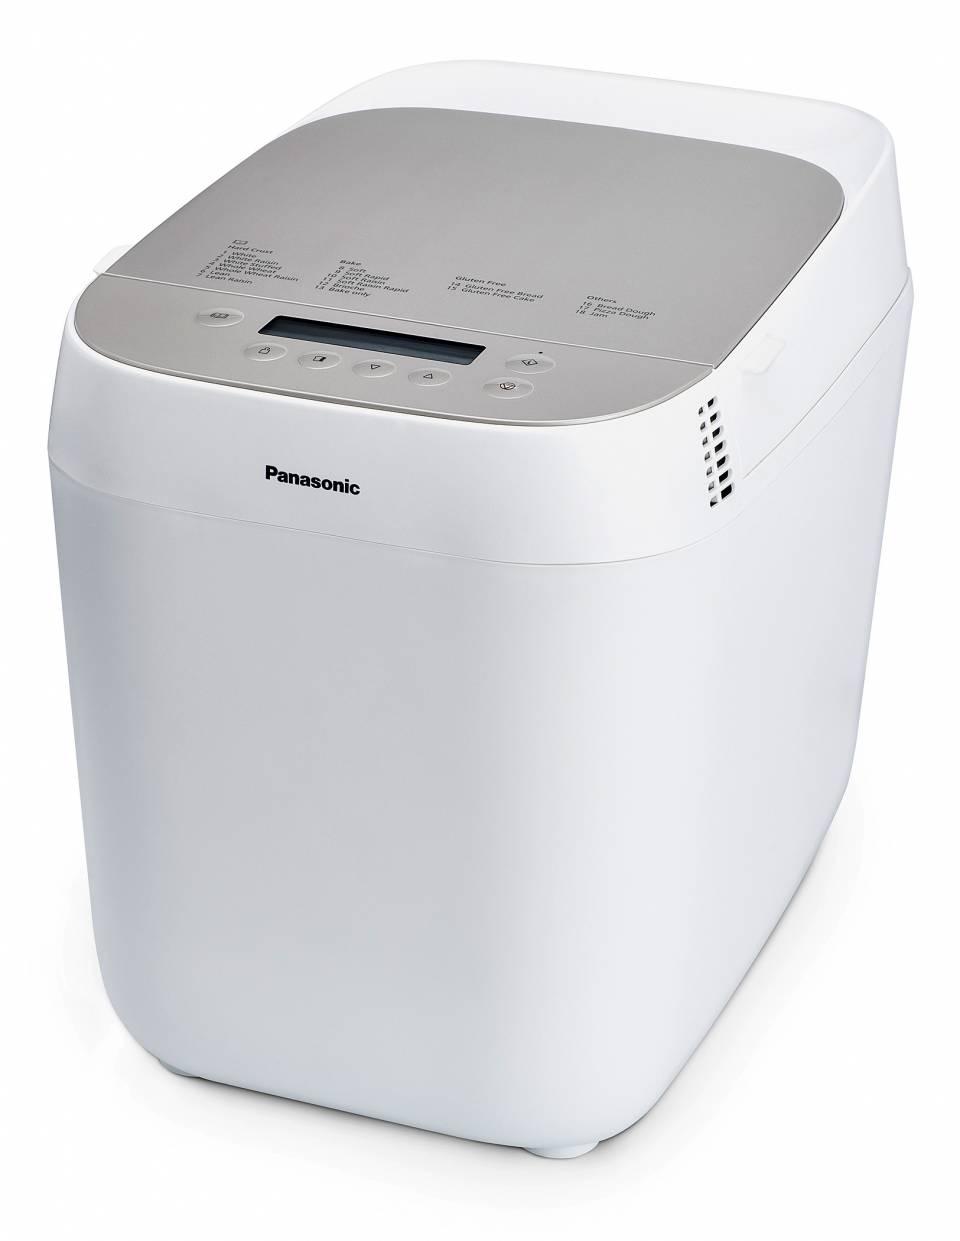 Panasonic Brotbackautomat Croustina backt Brote mit knusprigen Kruste und saftiger Krume.